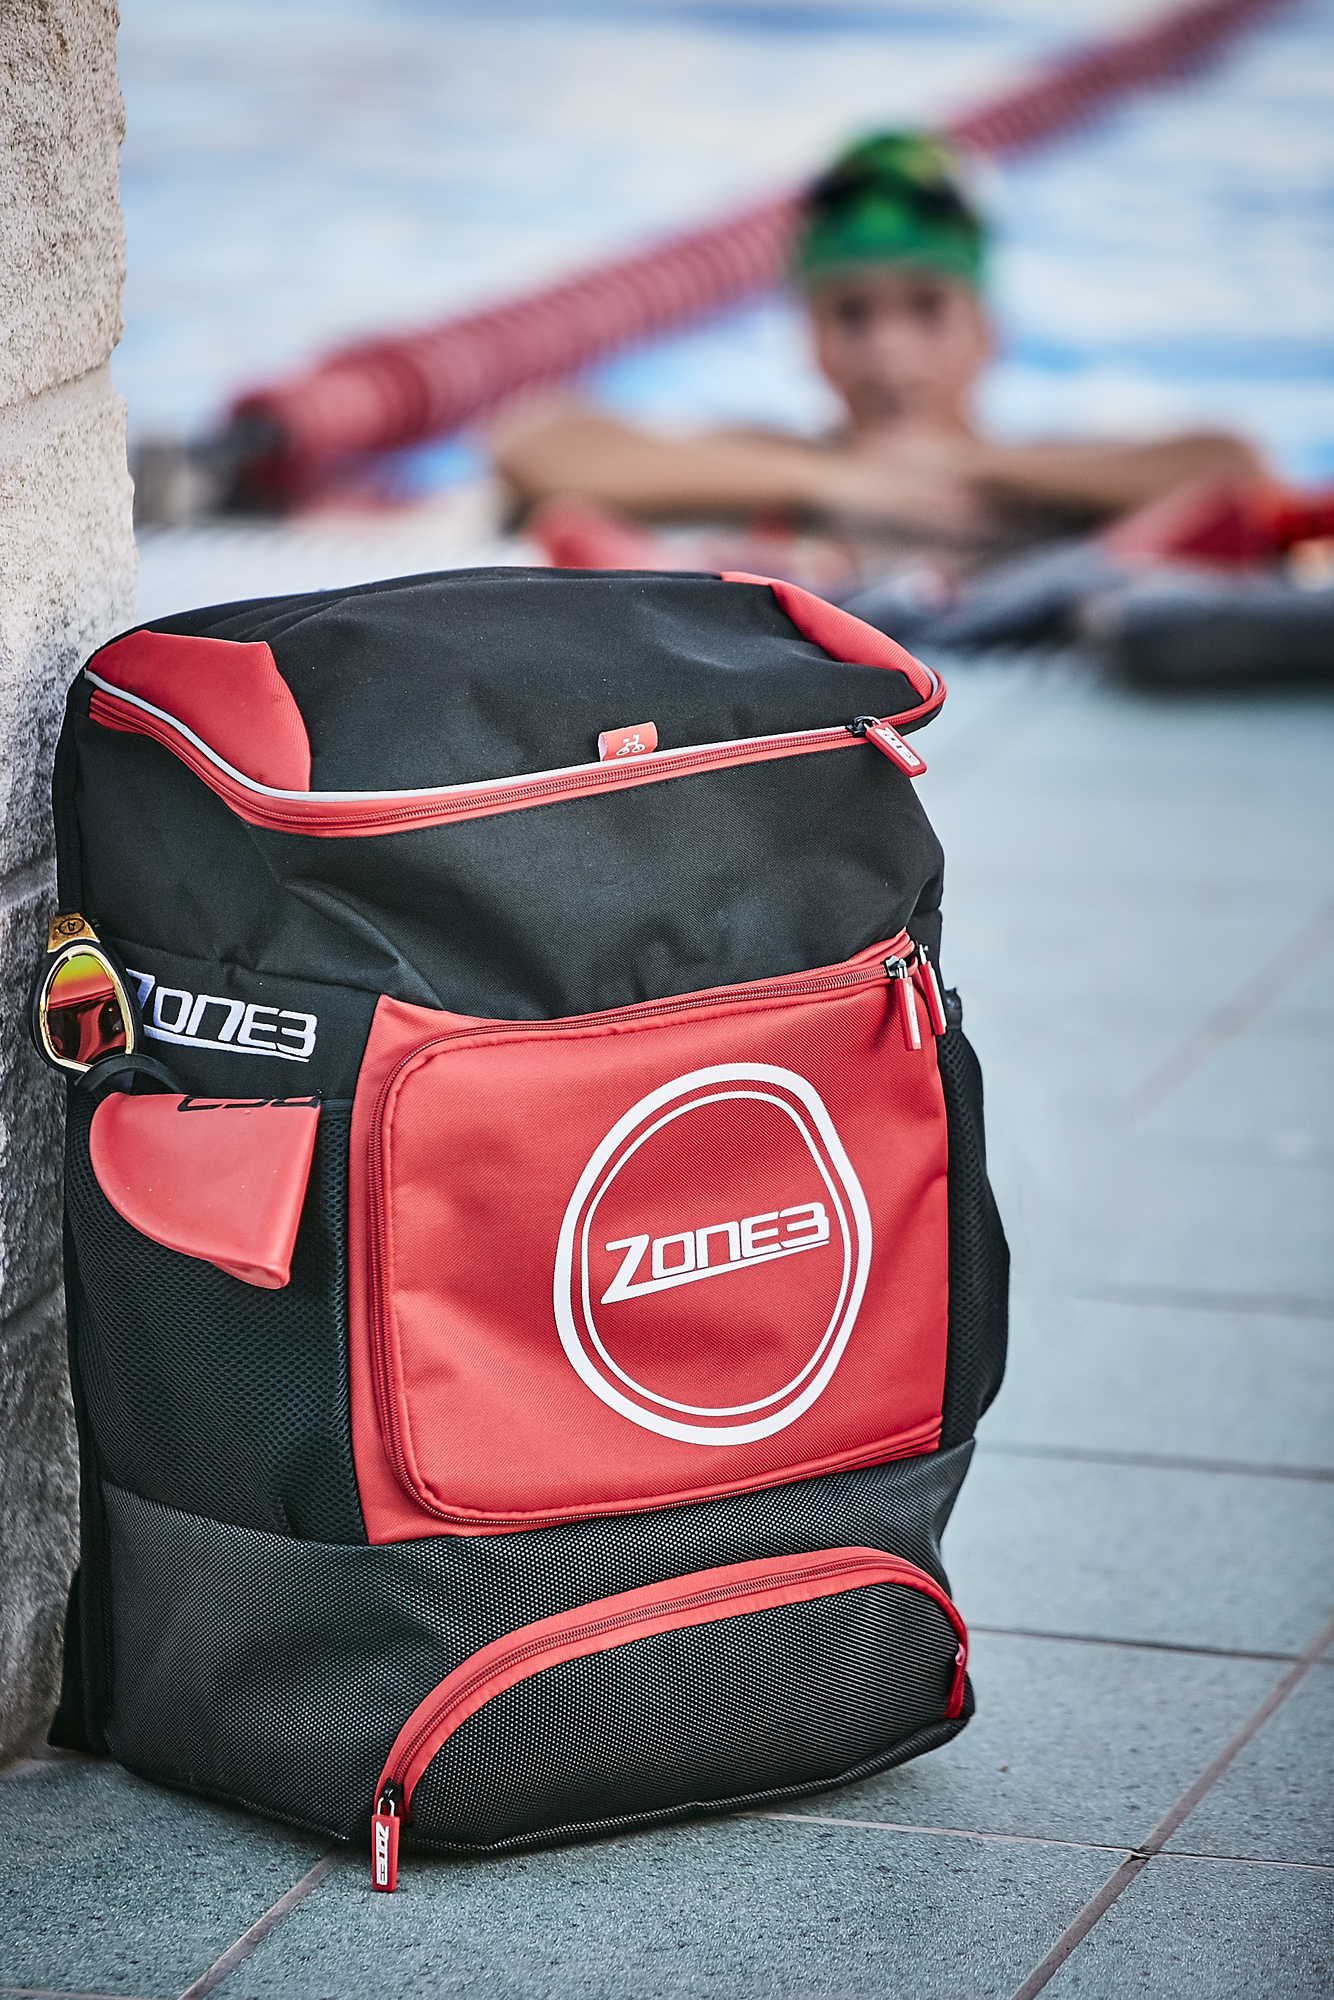 transition-bag-lifestyle.jpg